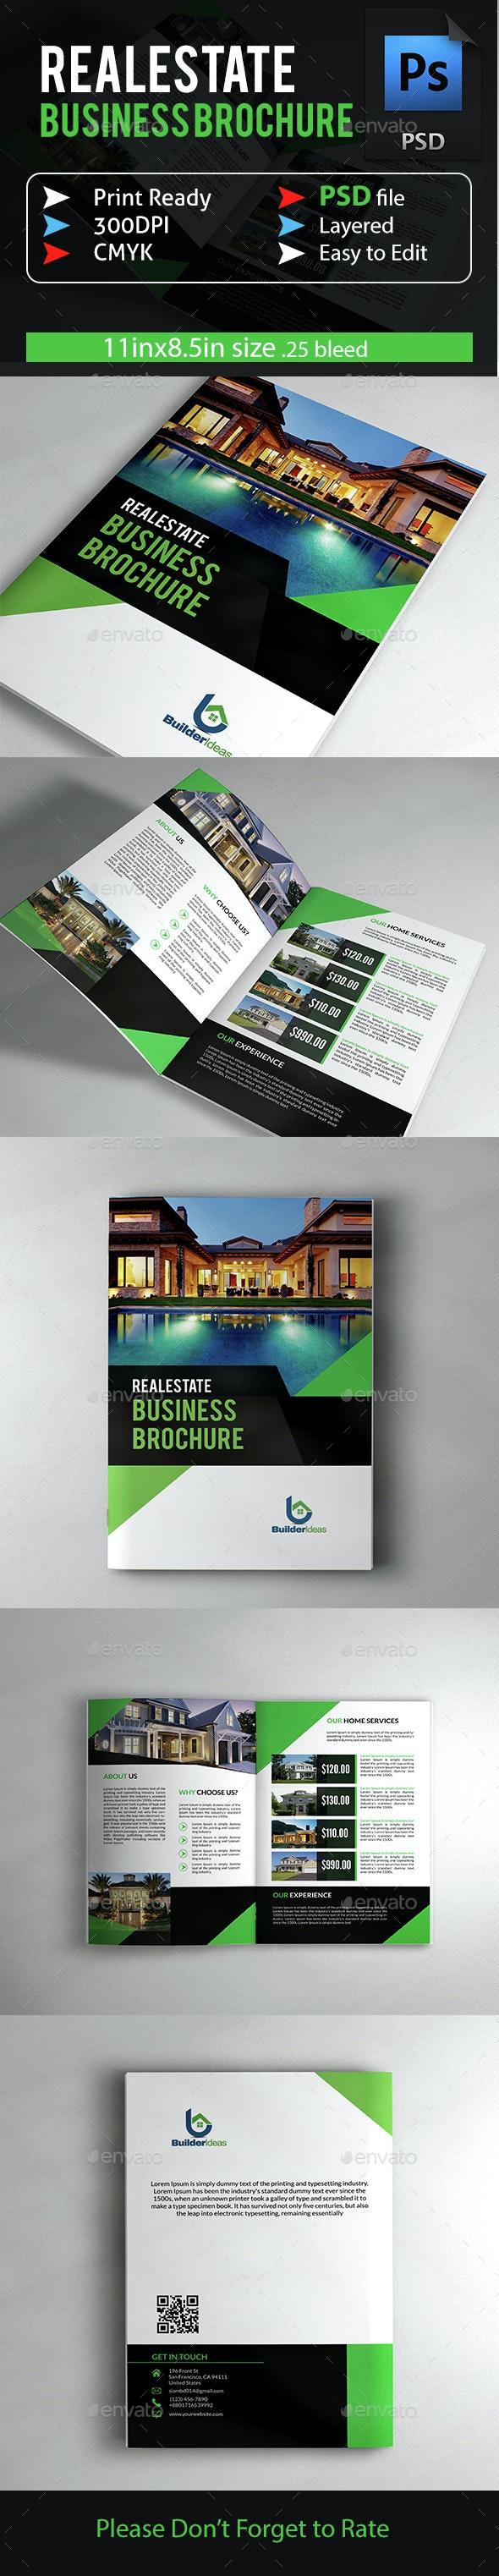 Real Estate Business Brochure - Brochures Print Templates